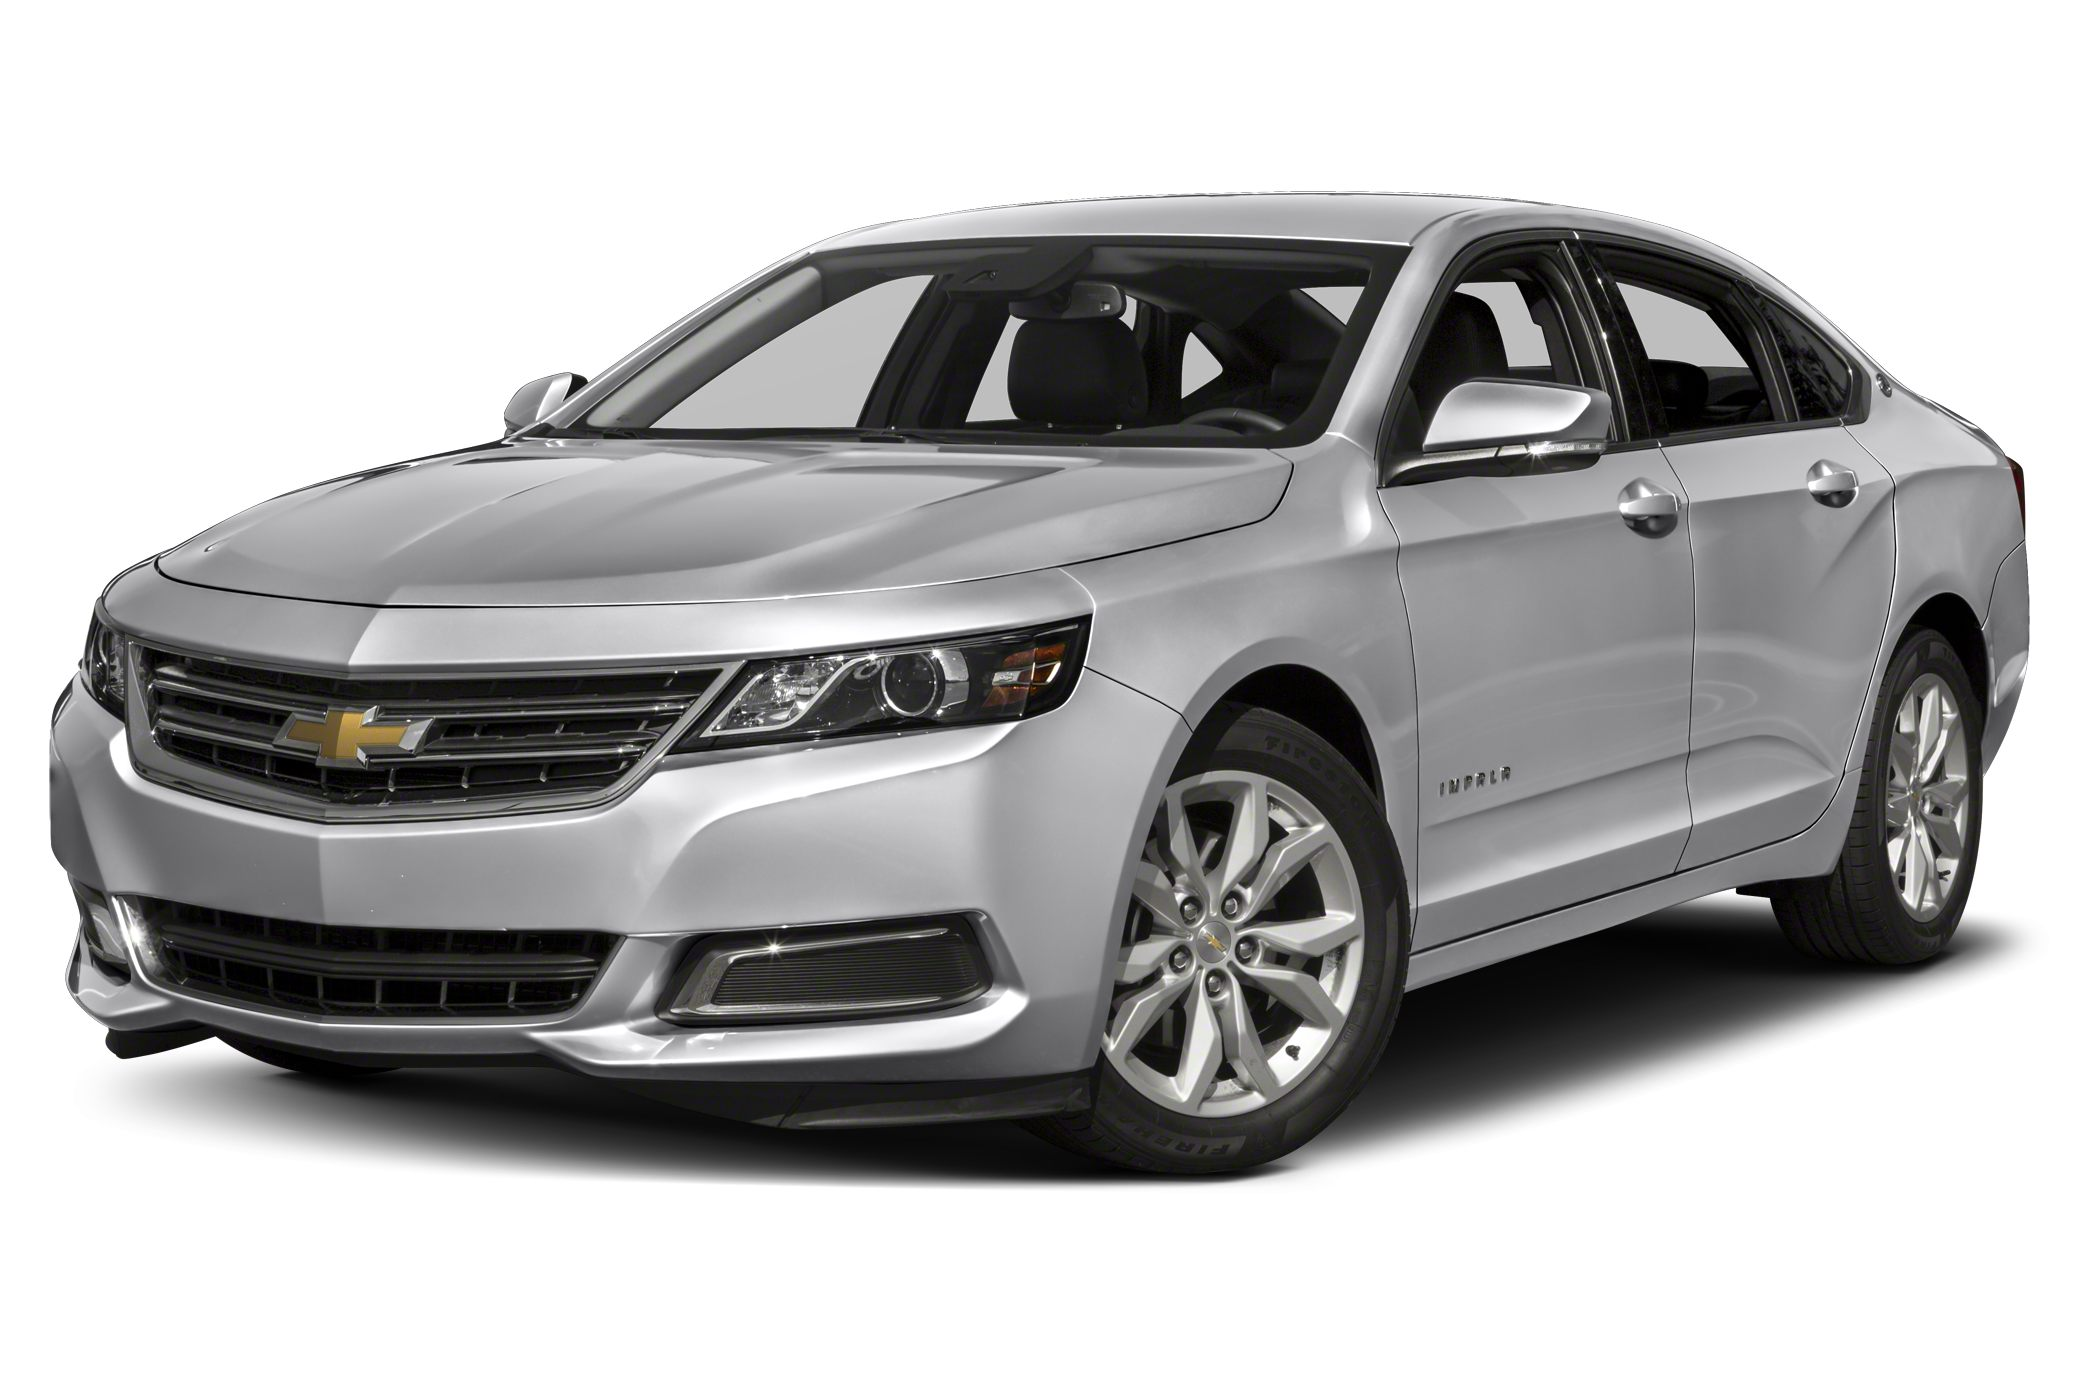 2006 Chevy Impala For Sale 2017 Chevrolet Impala Reviews, Specs and Prices | Cars.com